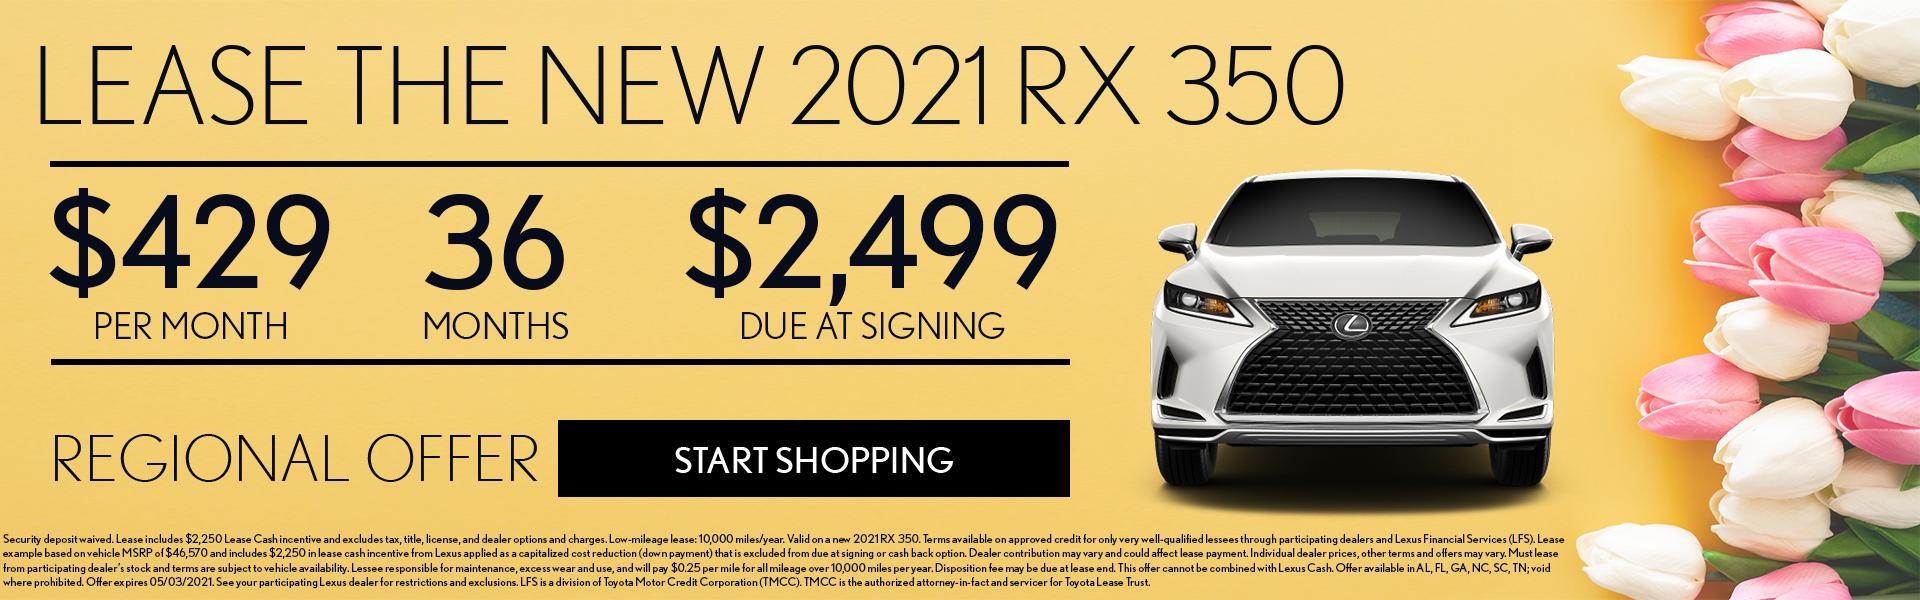 2021 RX 350 $429